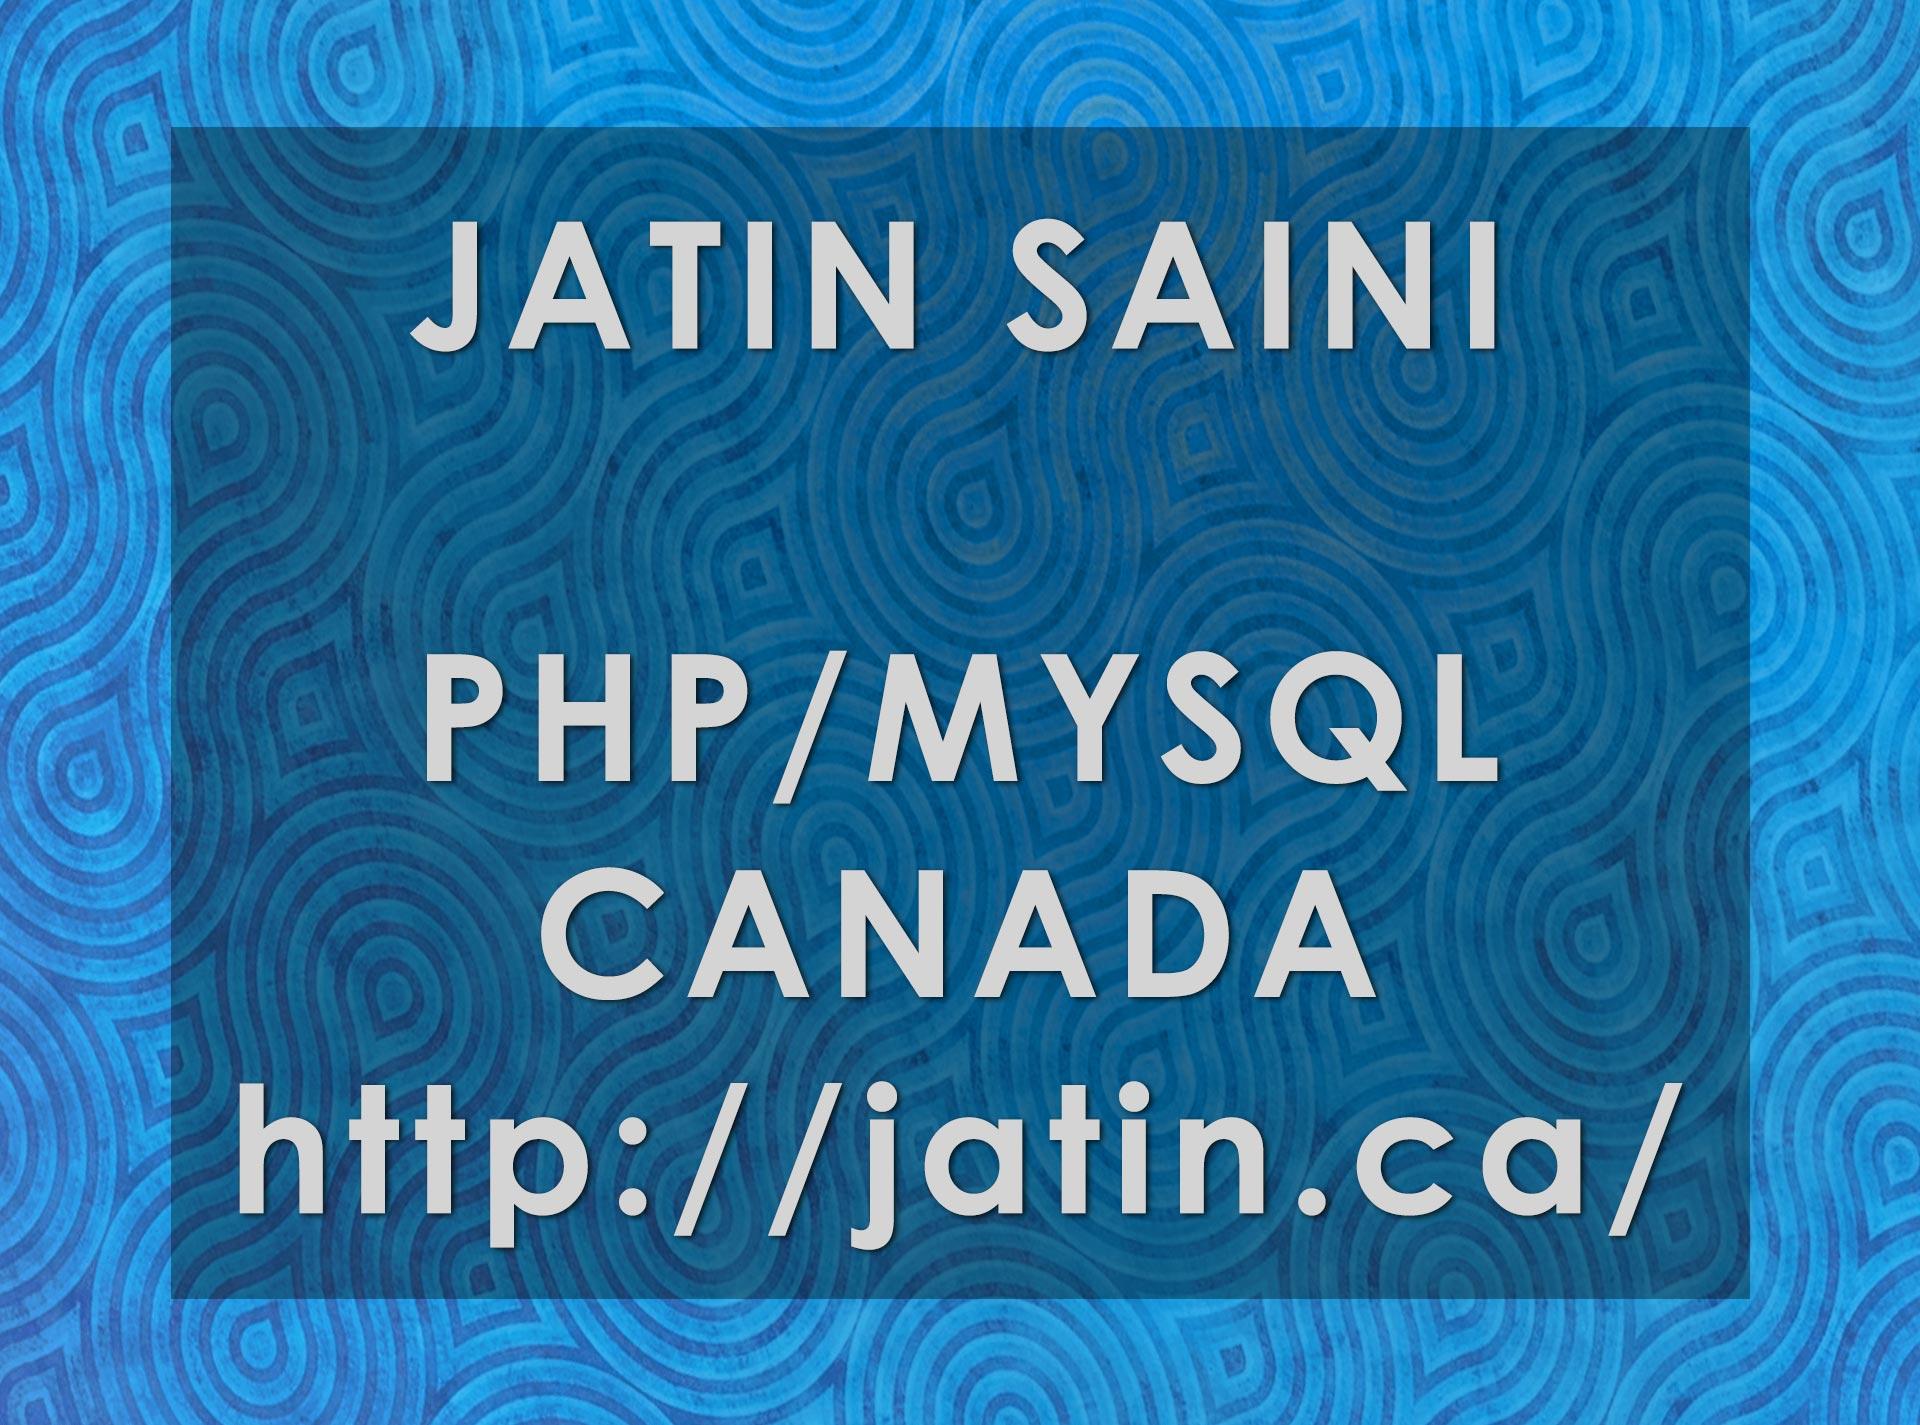 Jatin Saini Canadian Programmer